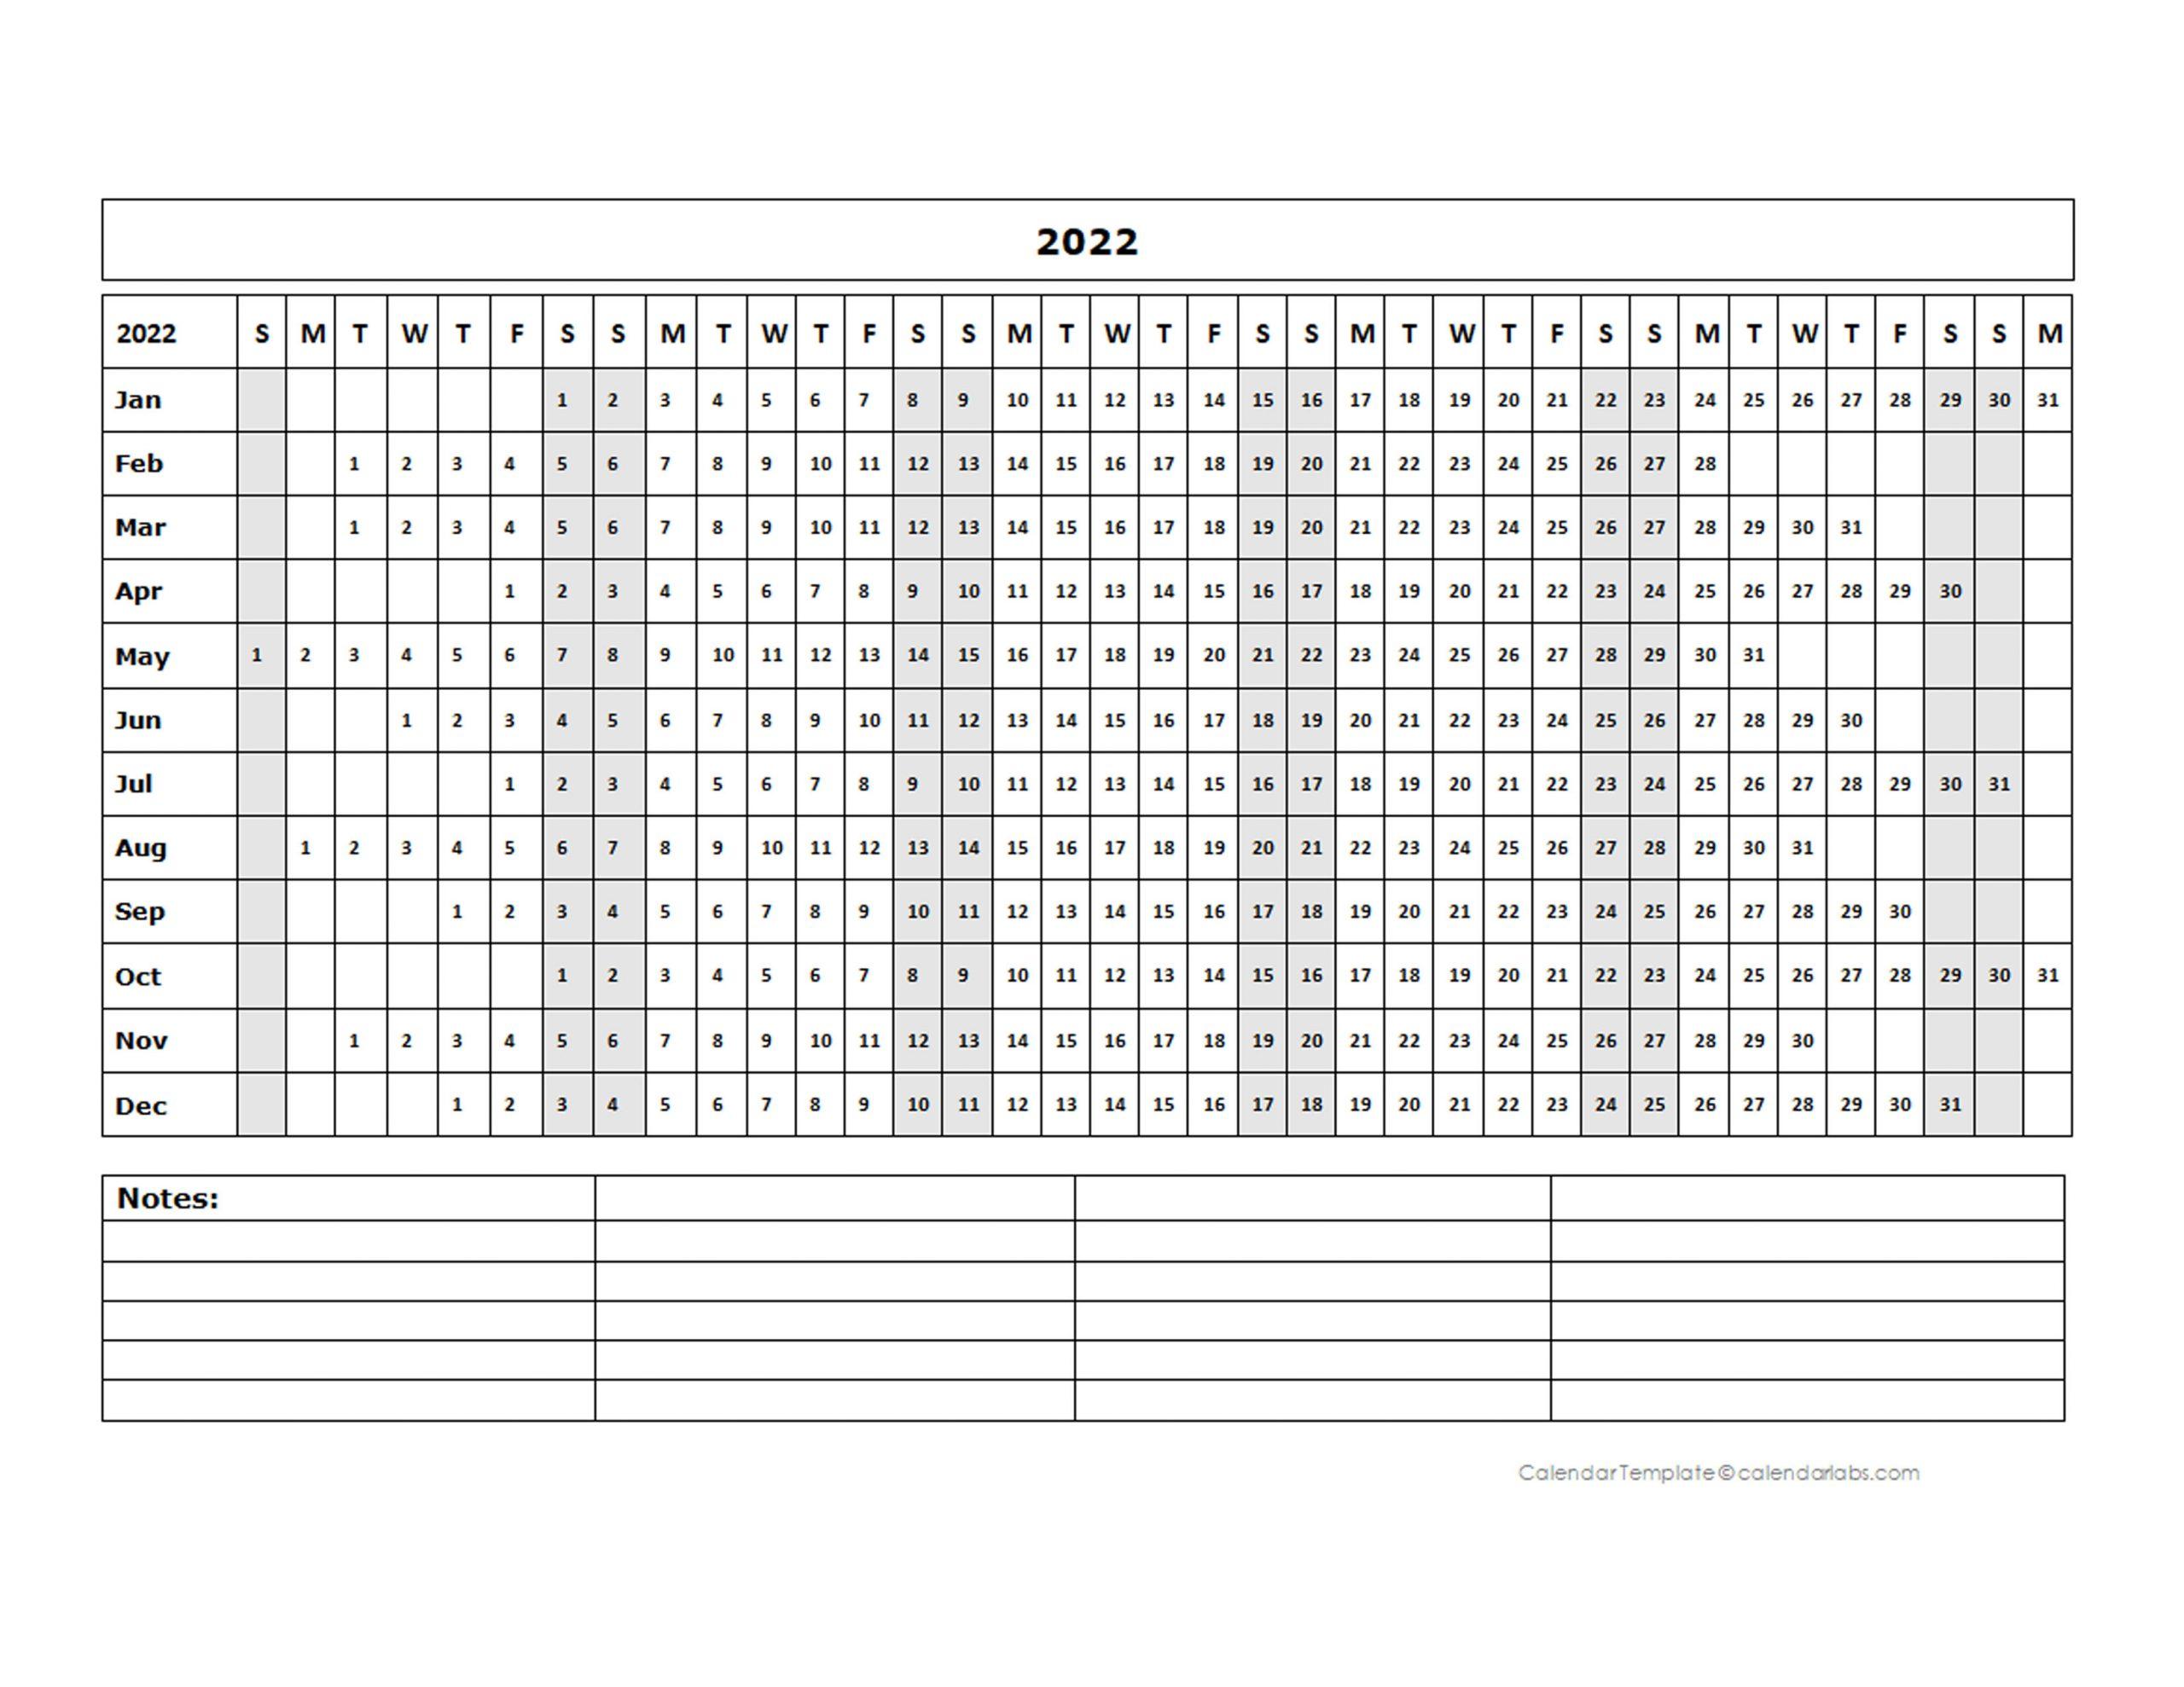 2022 Blank Landscape Yearly Calendar Template – Free In Julian Date Calendar For 2022